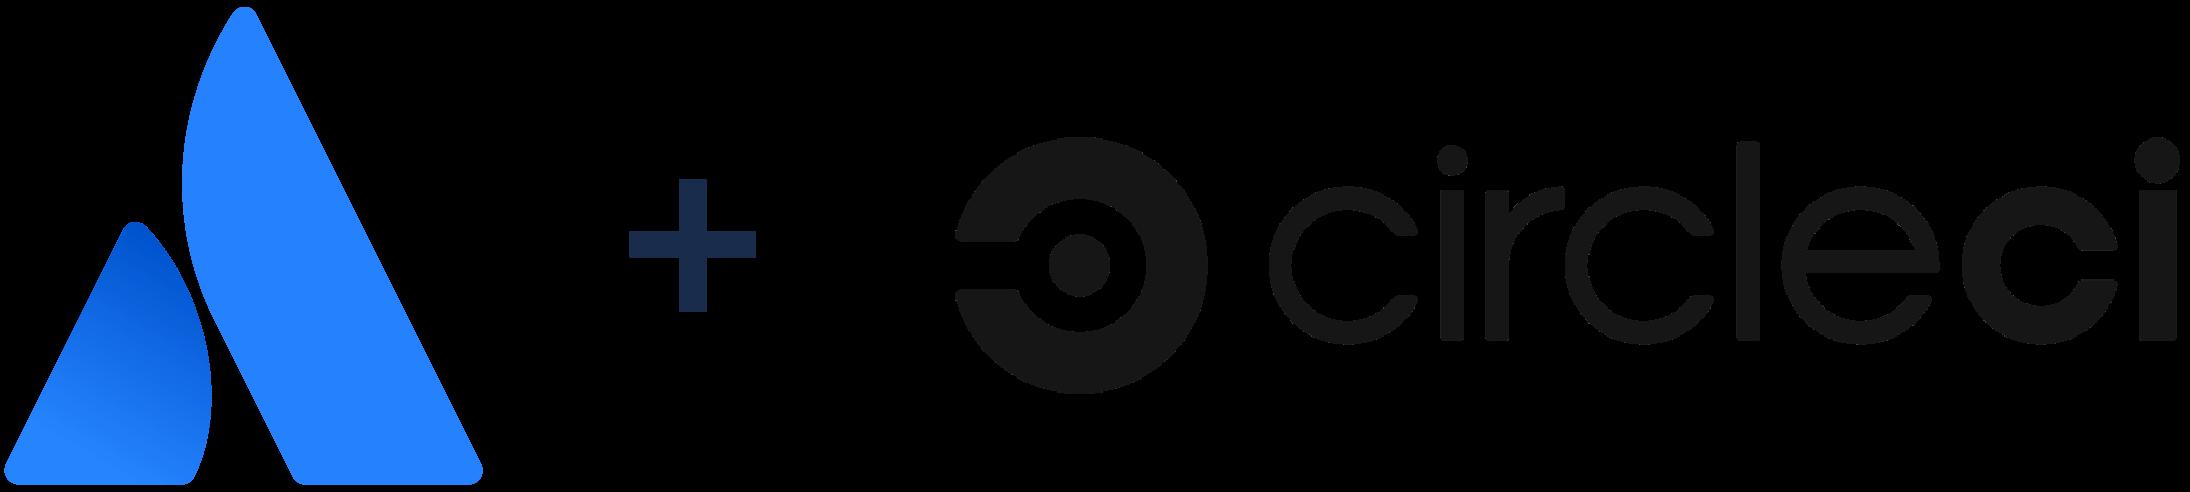 Atlassian logo + CircleCI logo